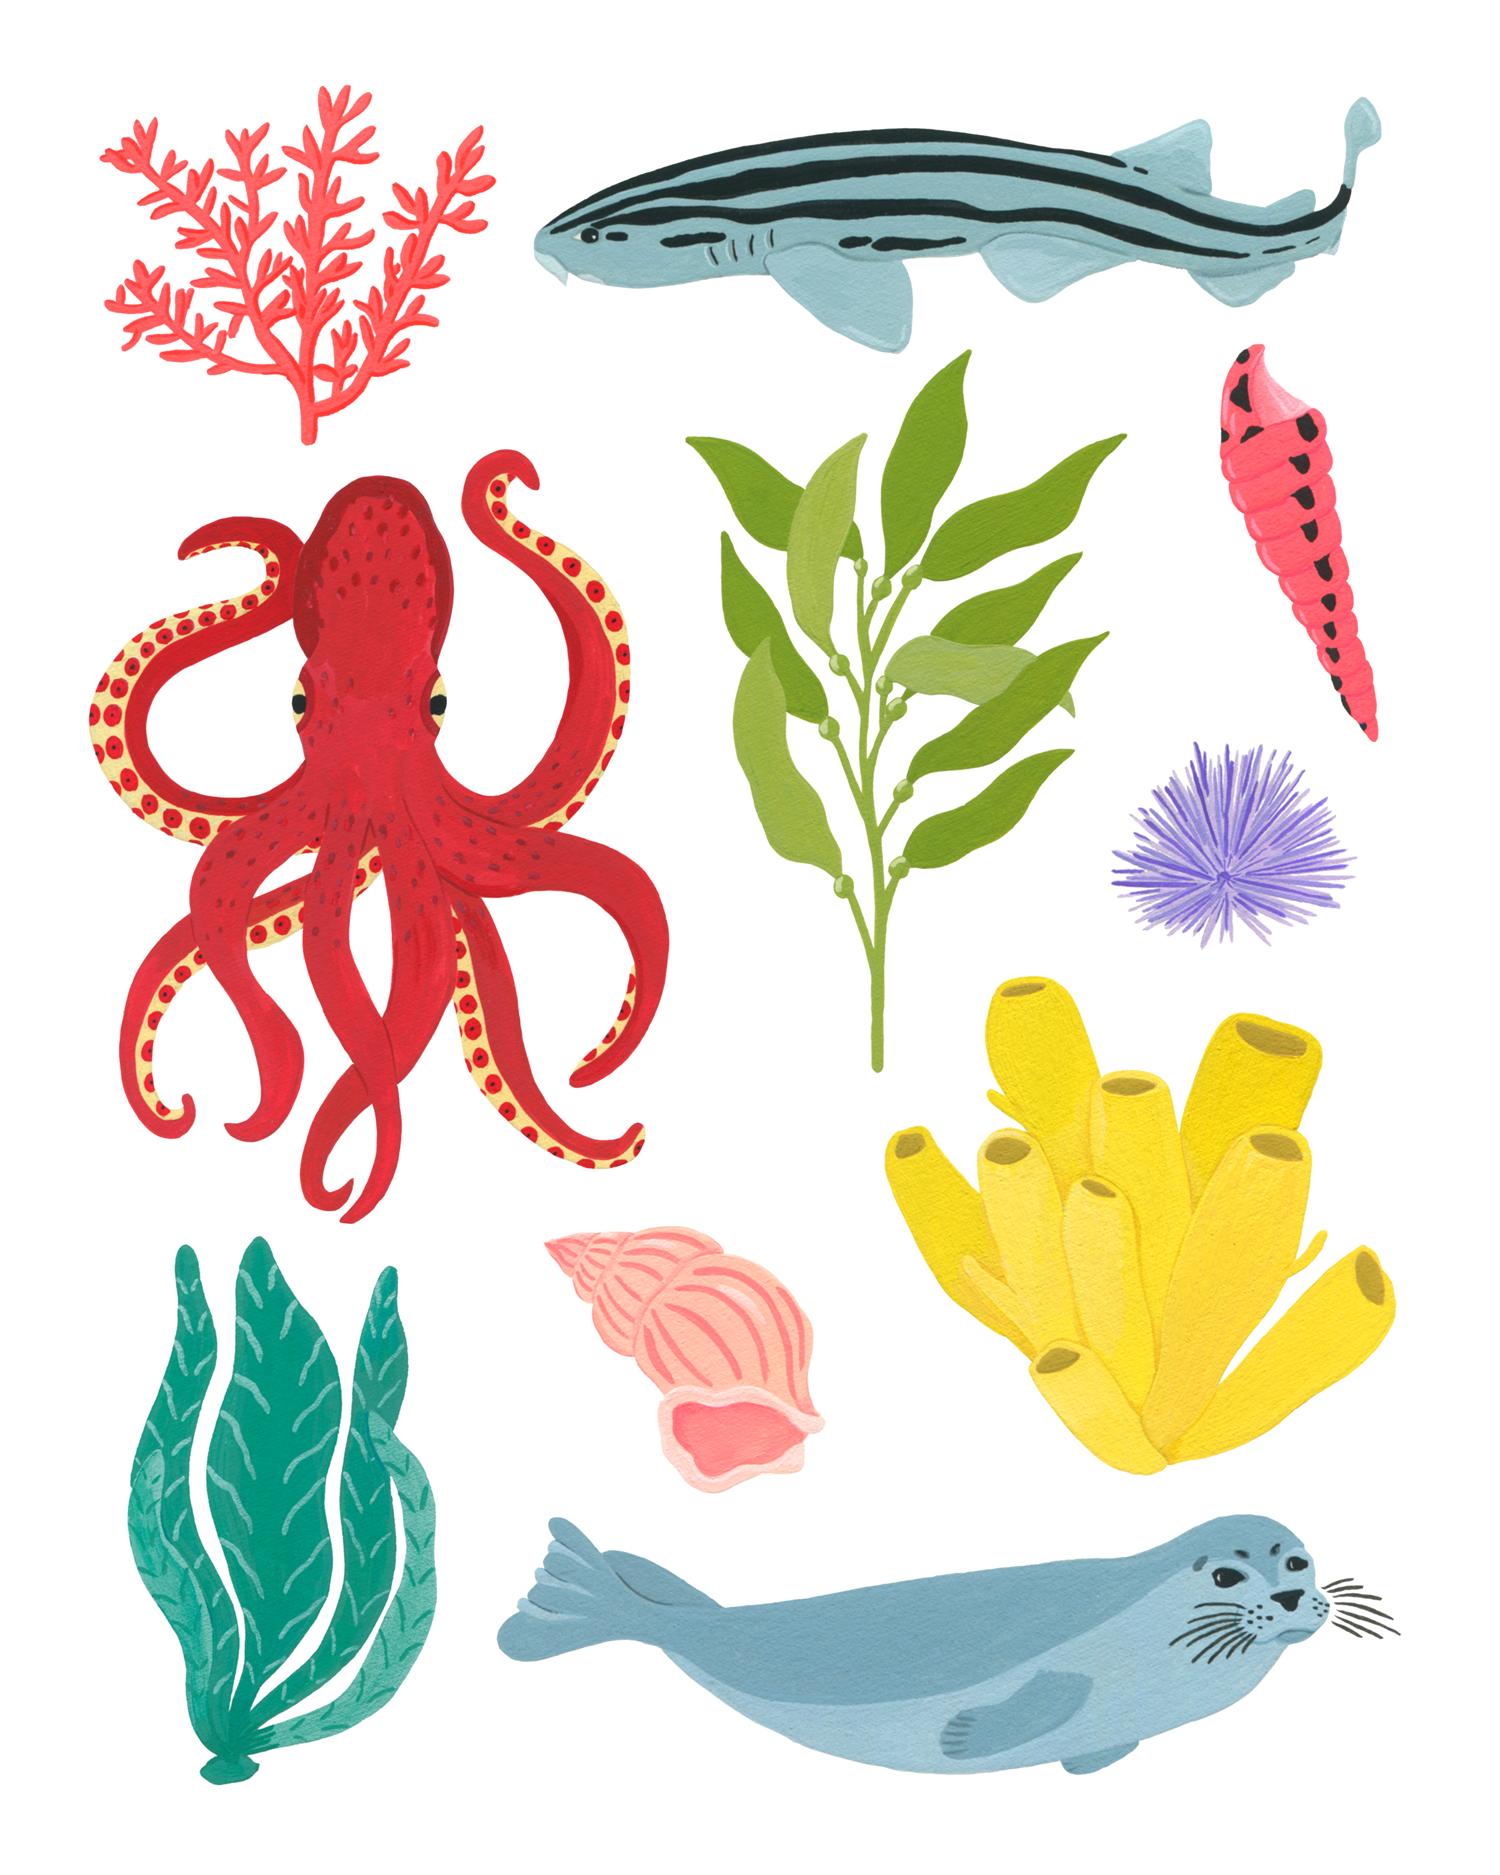 Marie-pellet-illustrations-portfolio-gouache-myoctopusteacher-seal-shark-corail-shell-octopus-projet-personnel-coquillages-algues